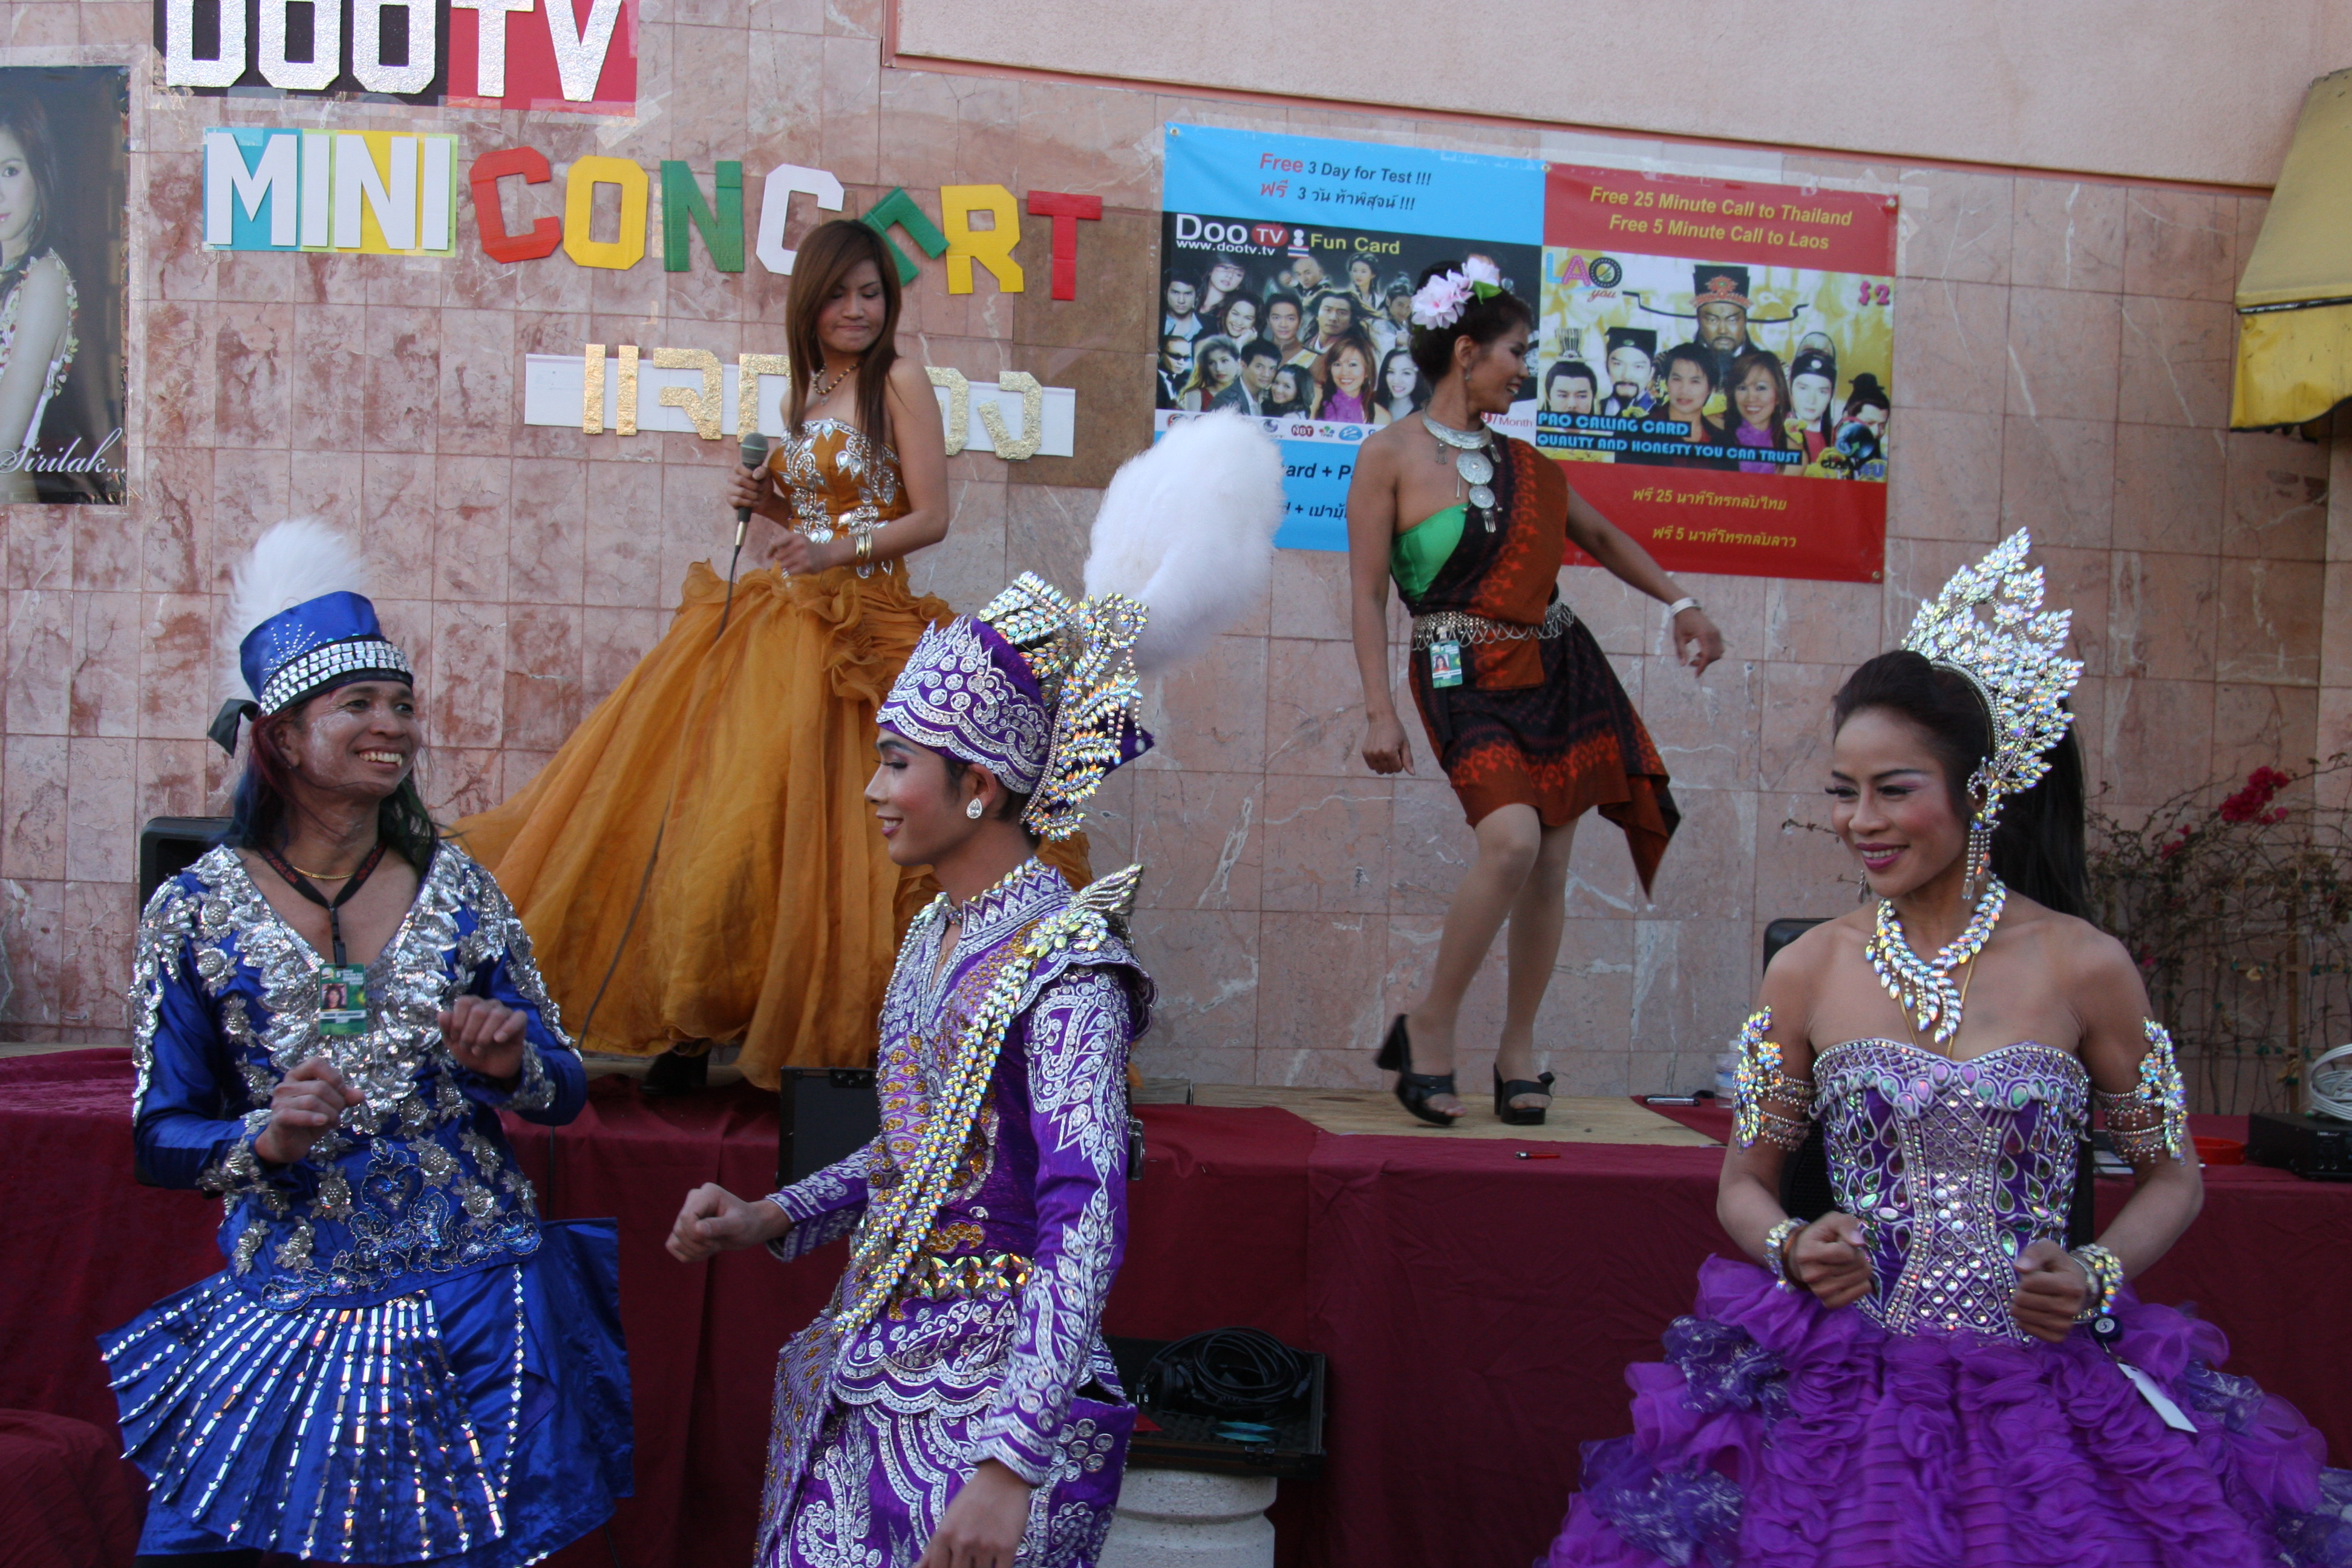 Festival entertainment